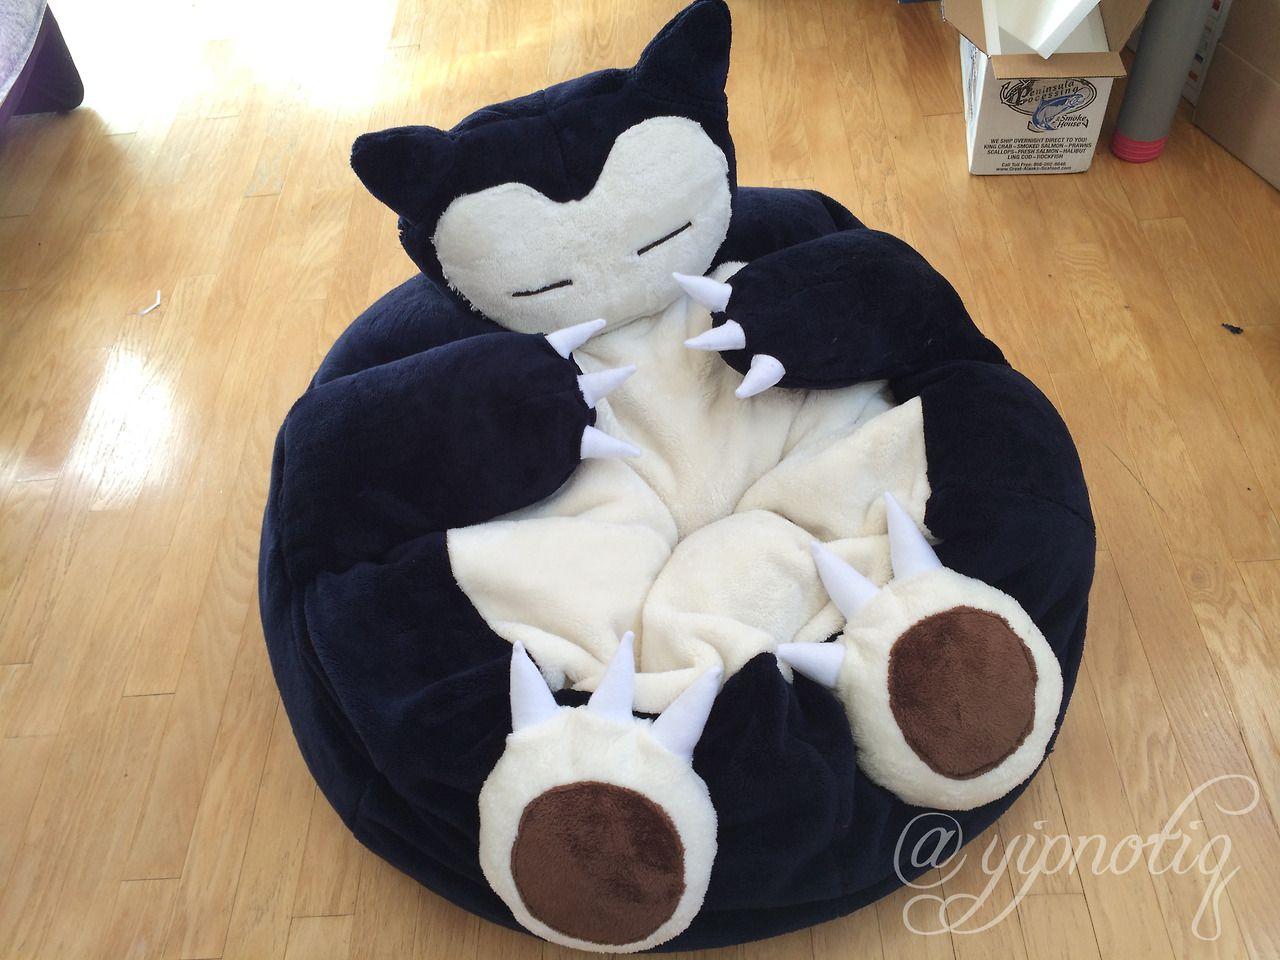 snorlax bean bag chair shower cvs beanbag pinterest bags search